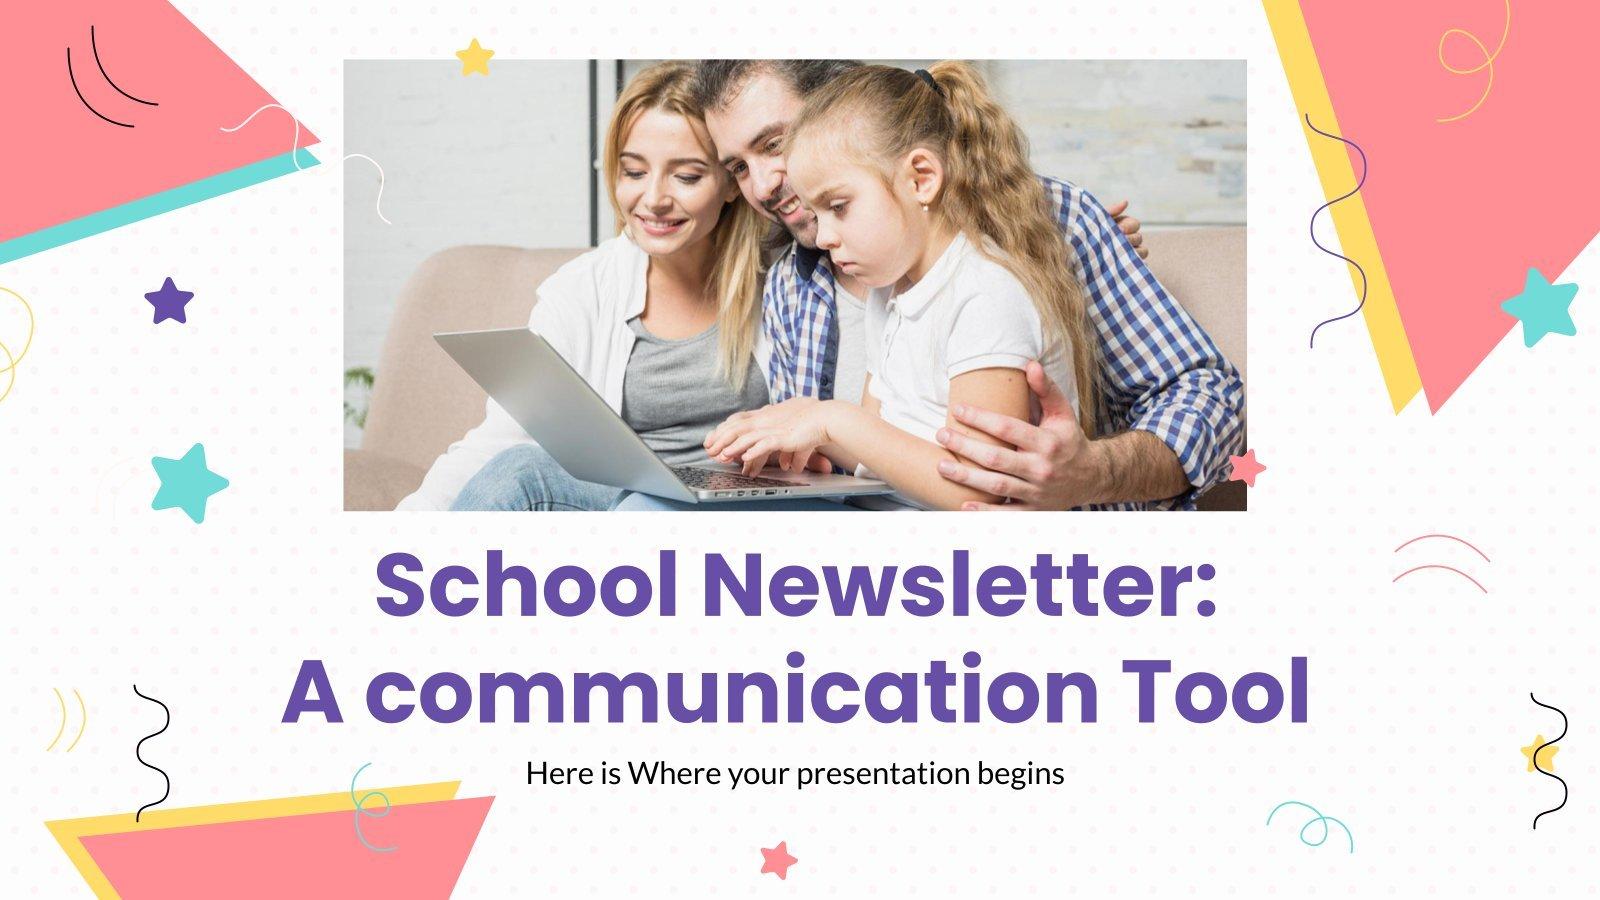 School Newsletter: A Communication Tool presentation template